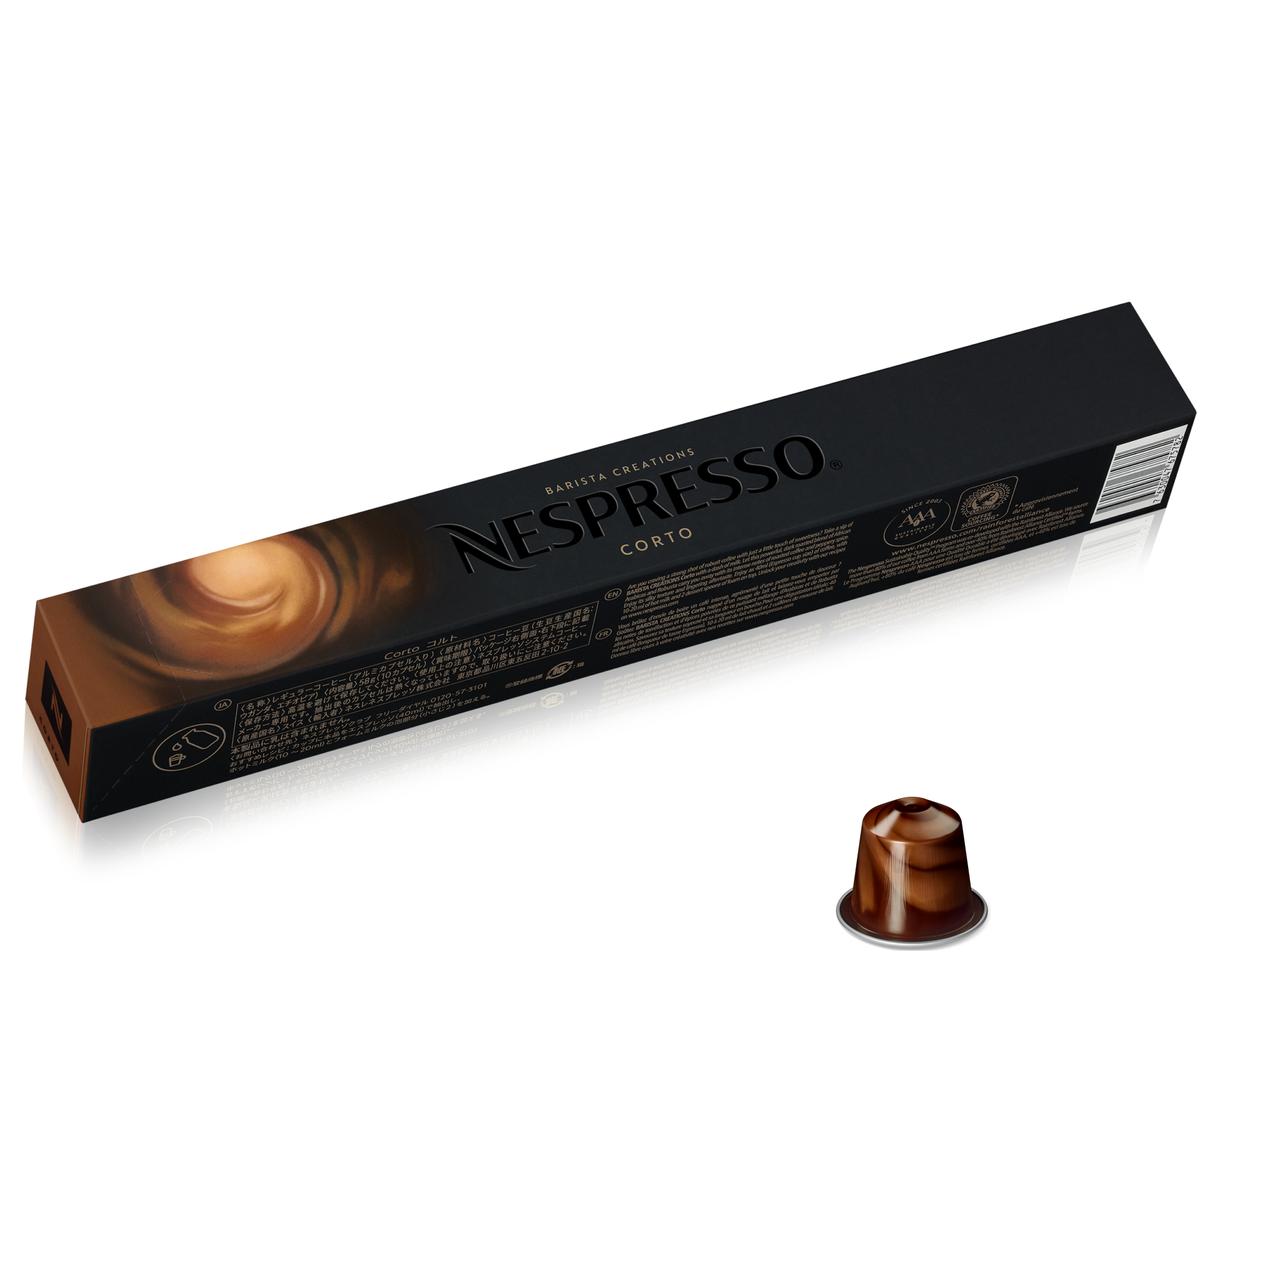 Кофе в капсулах Nespresso BARISTA Corto Limited Edition 10 (тубус 10 шт.), Швейцария (Неспрессо оригинал)